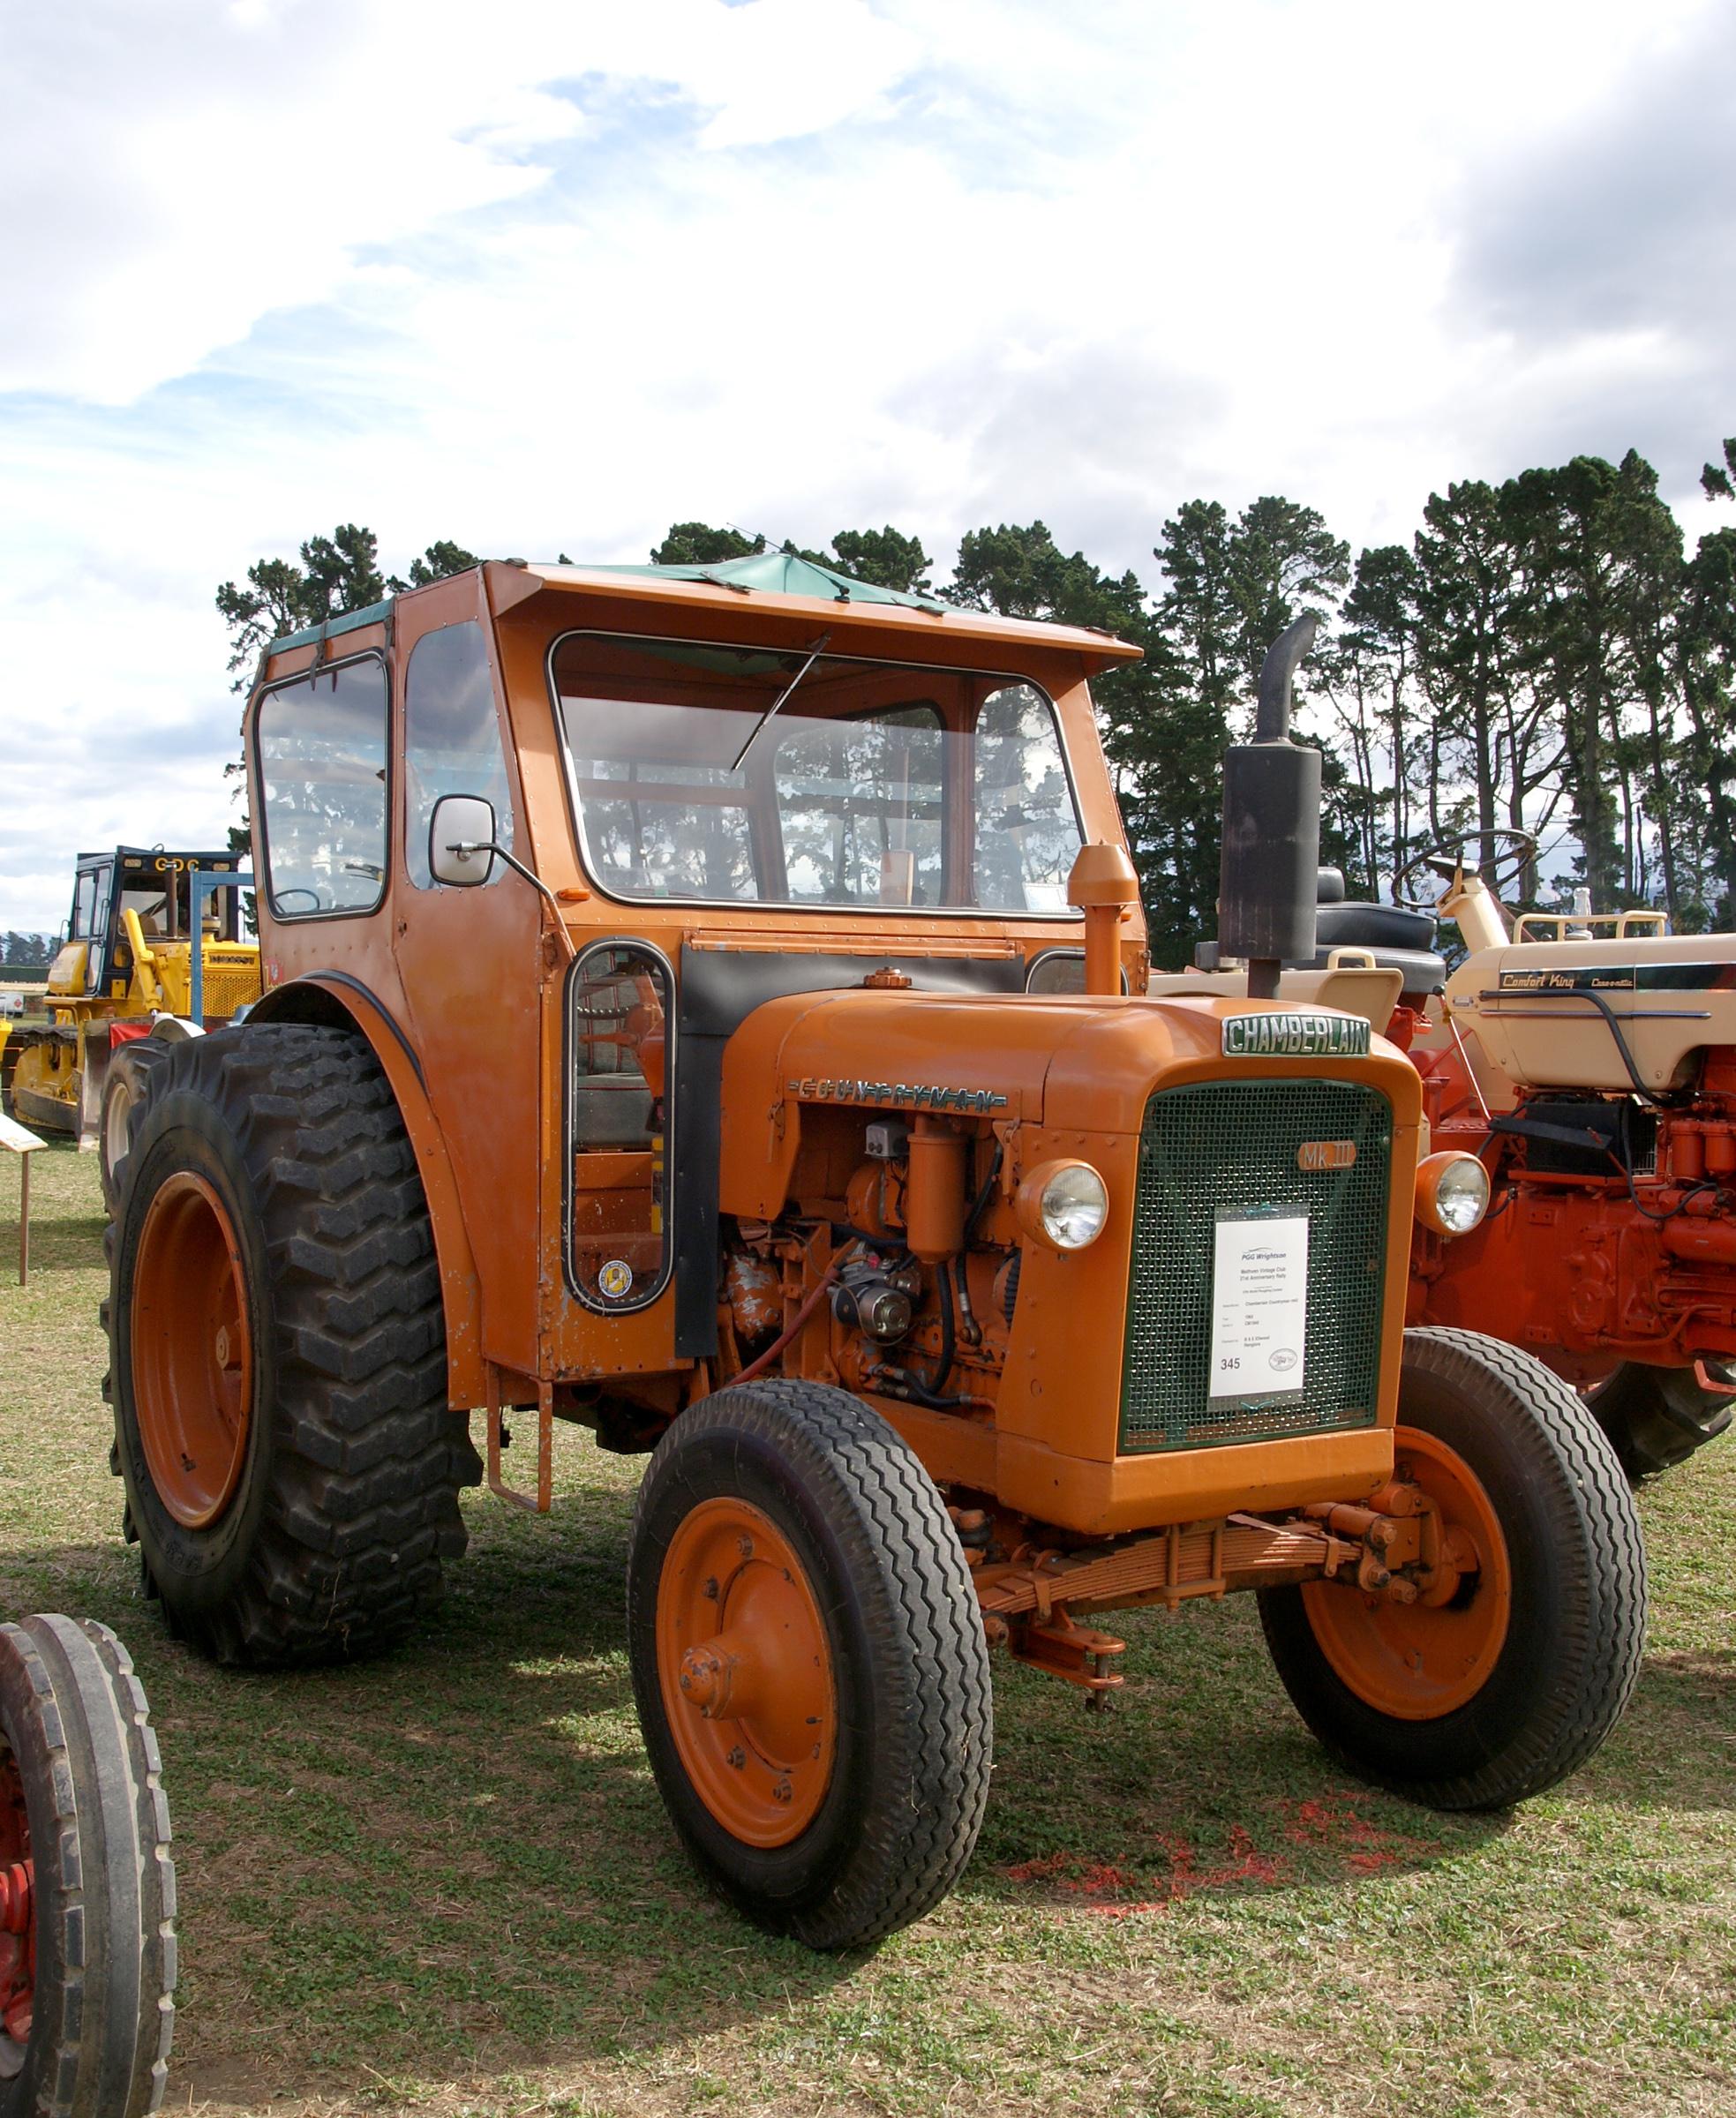 марки и картинки тракторов те, кто